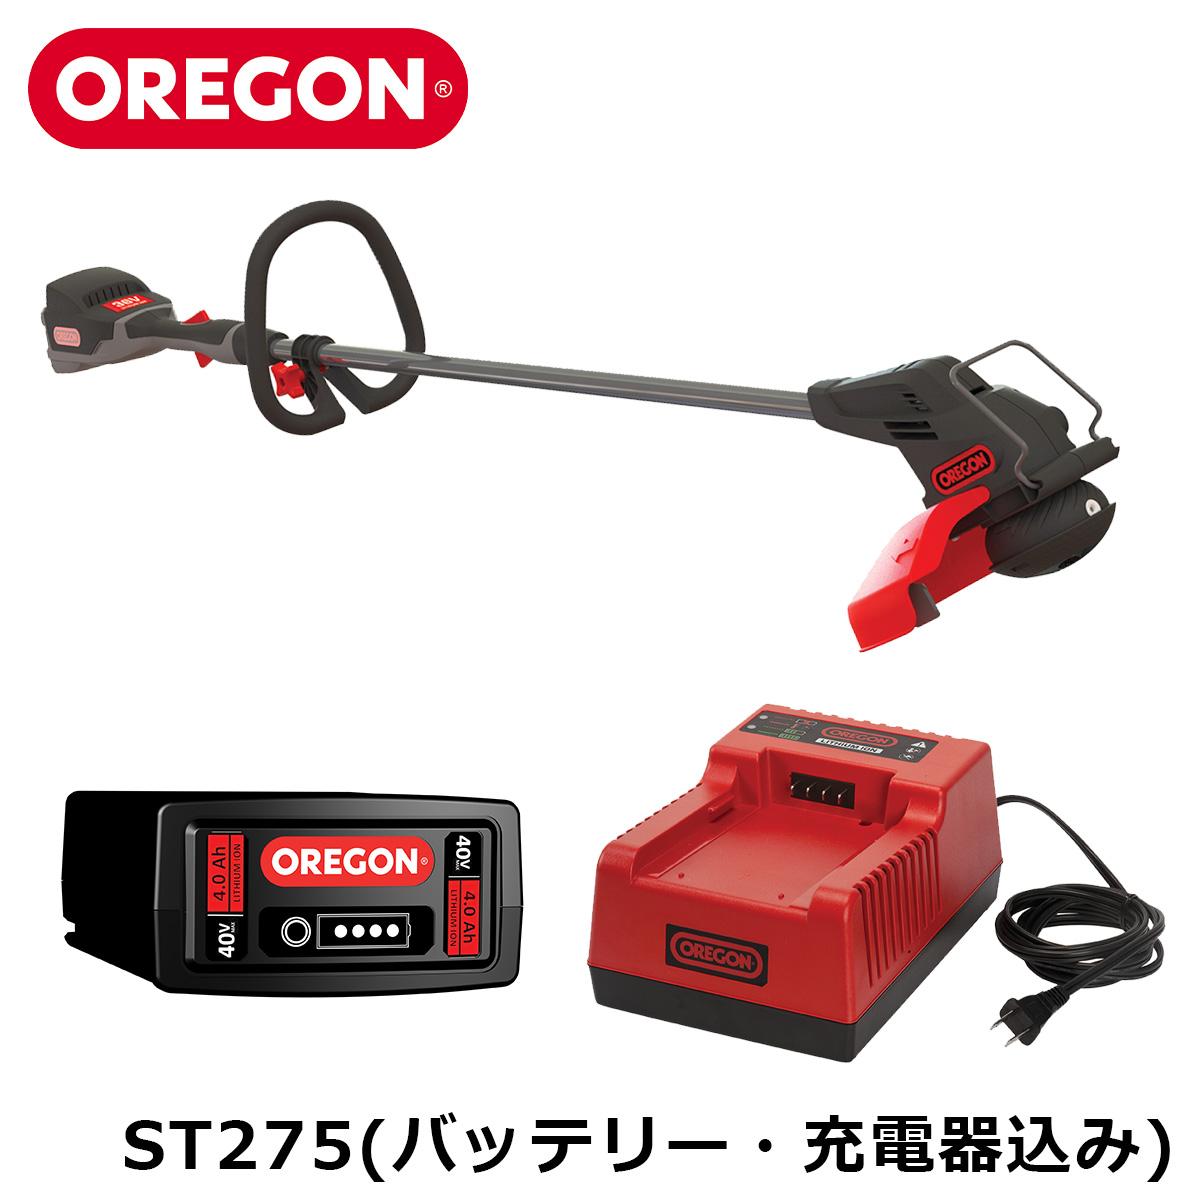 OREGON ST275-A7 CTS 電動刈払機 バッテリー式 コードレス 高性能 オレゴン 【バッテリー、充電器込み】